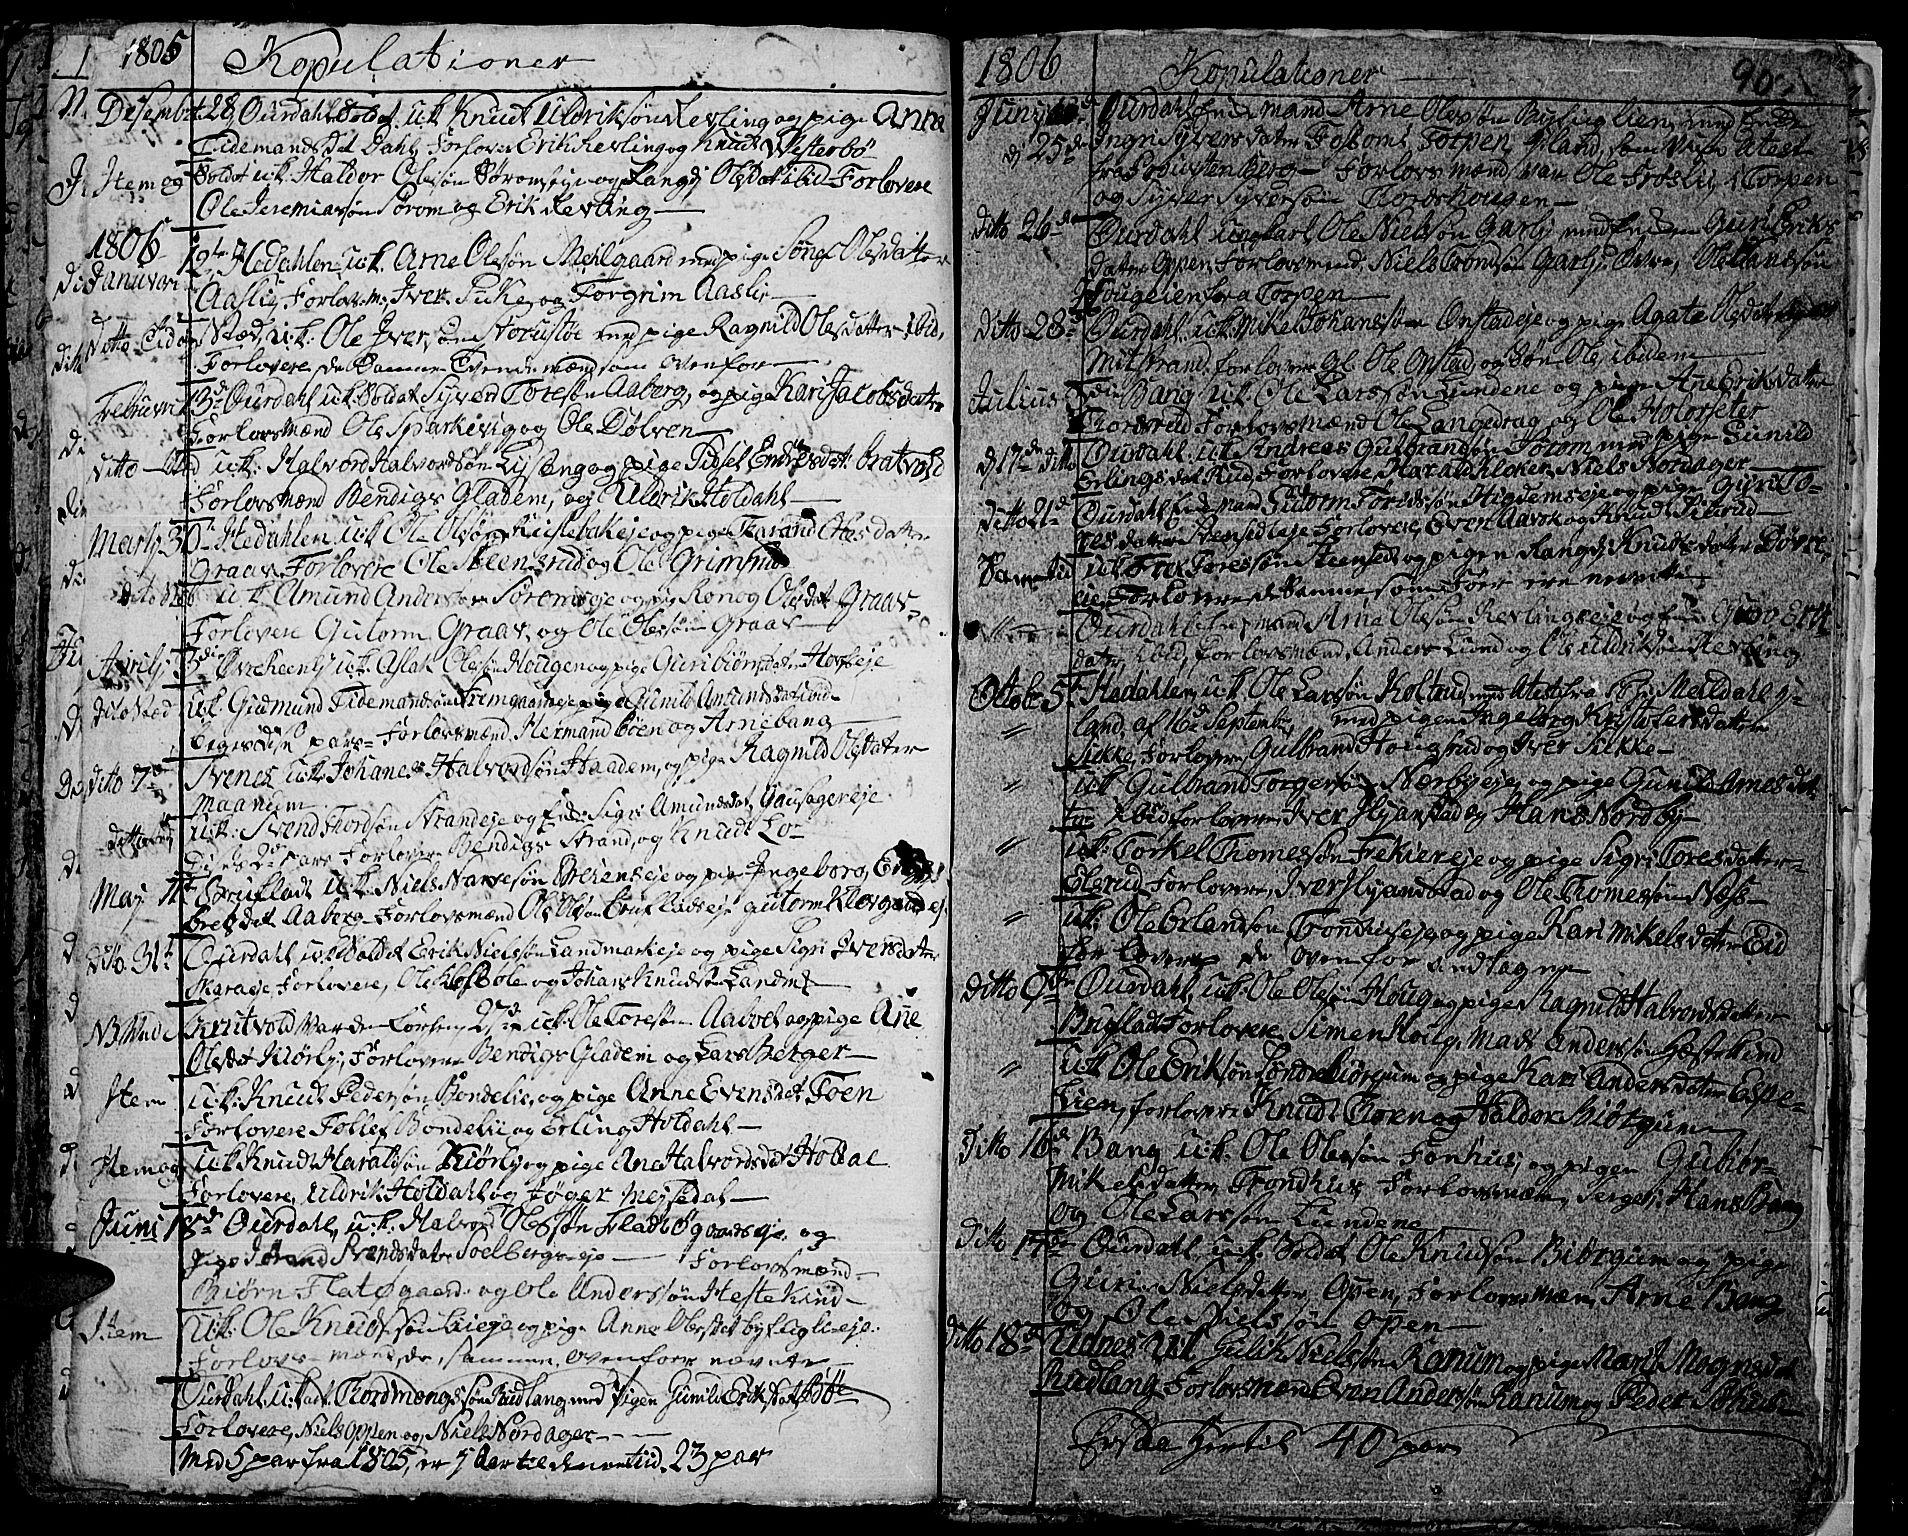 SAH, Aurdal prestekontor, Ministerialbok nr. 7, 1800-1808, s. 90